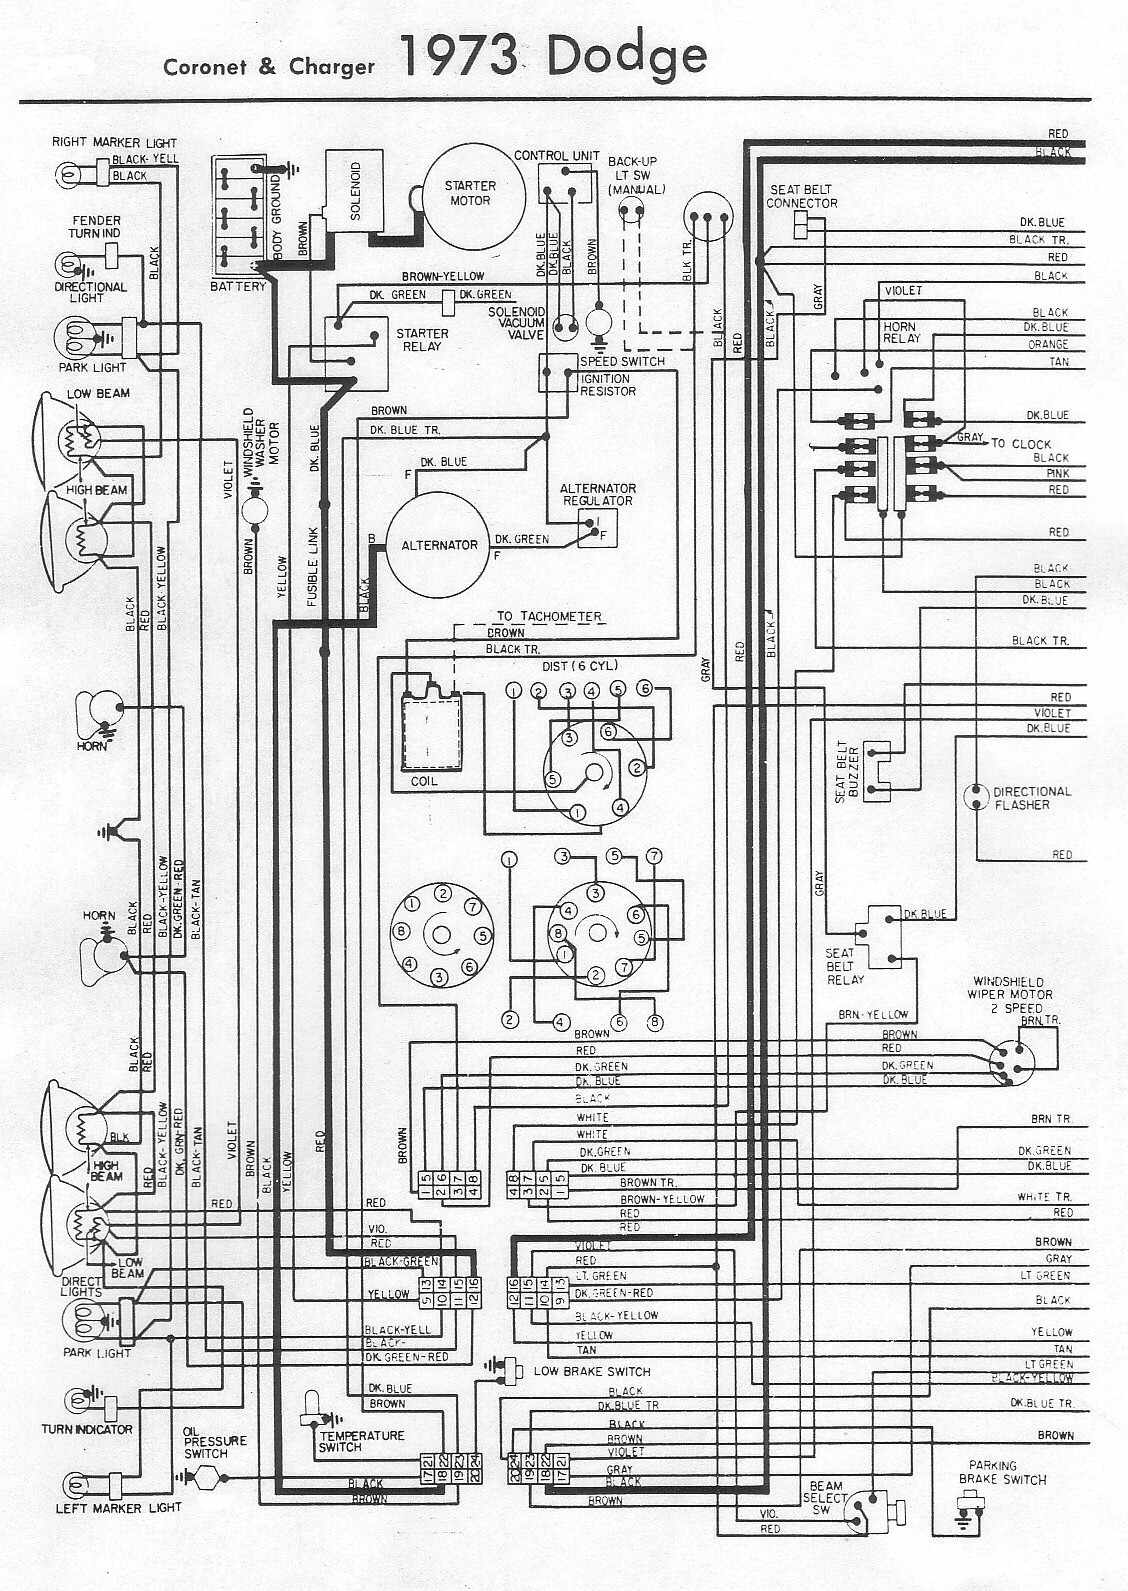 Dodge Dart Wiring Harness - Wiring Diagram All Data on 1973 dodge dart vacuum diagram, 2011 dodge charger wiring diagram, distributor wiring diagram, mopar ballast resistor wiring diagram,